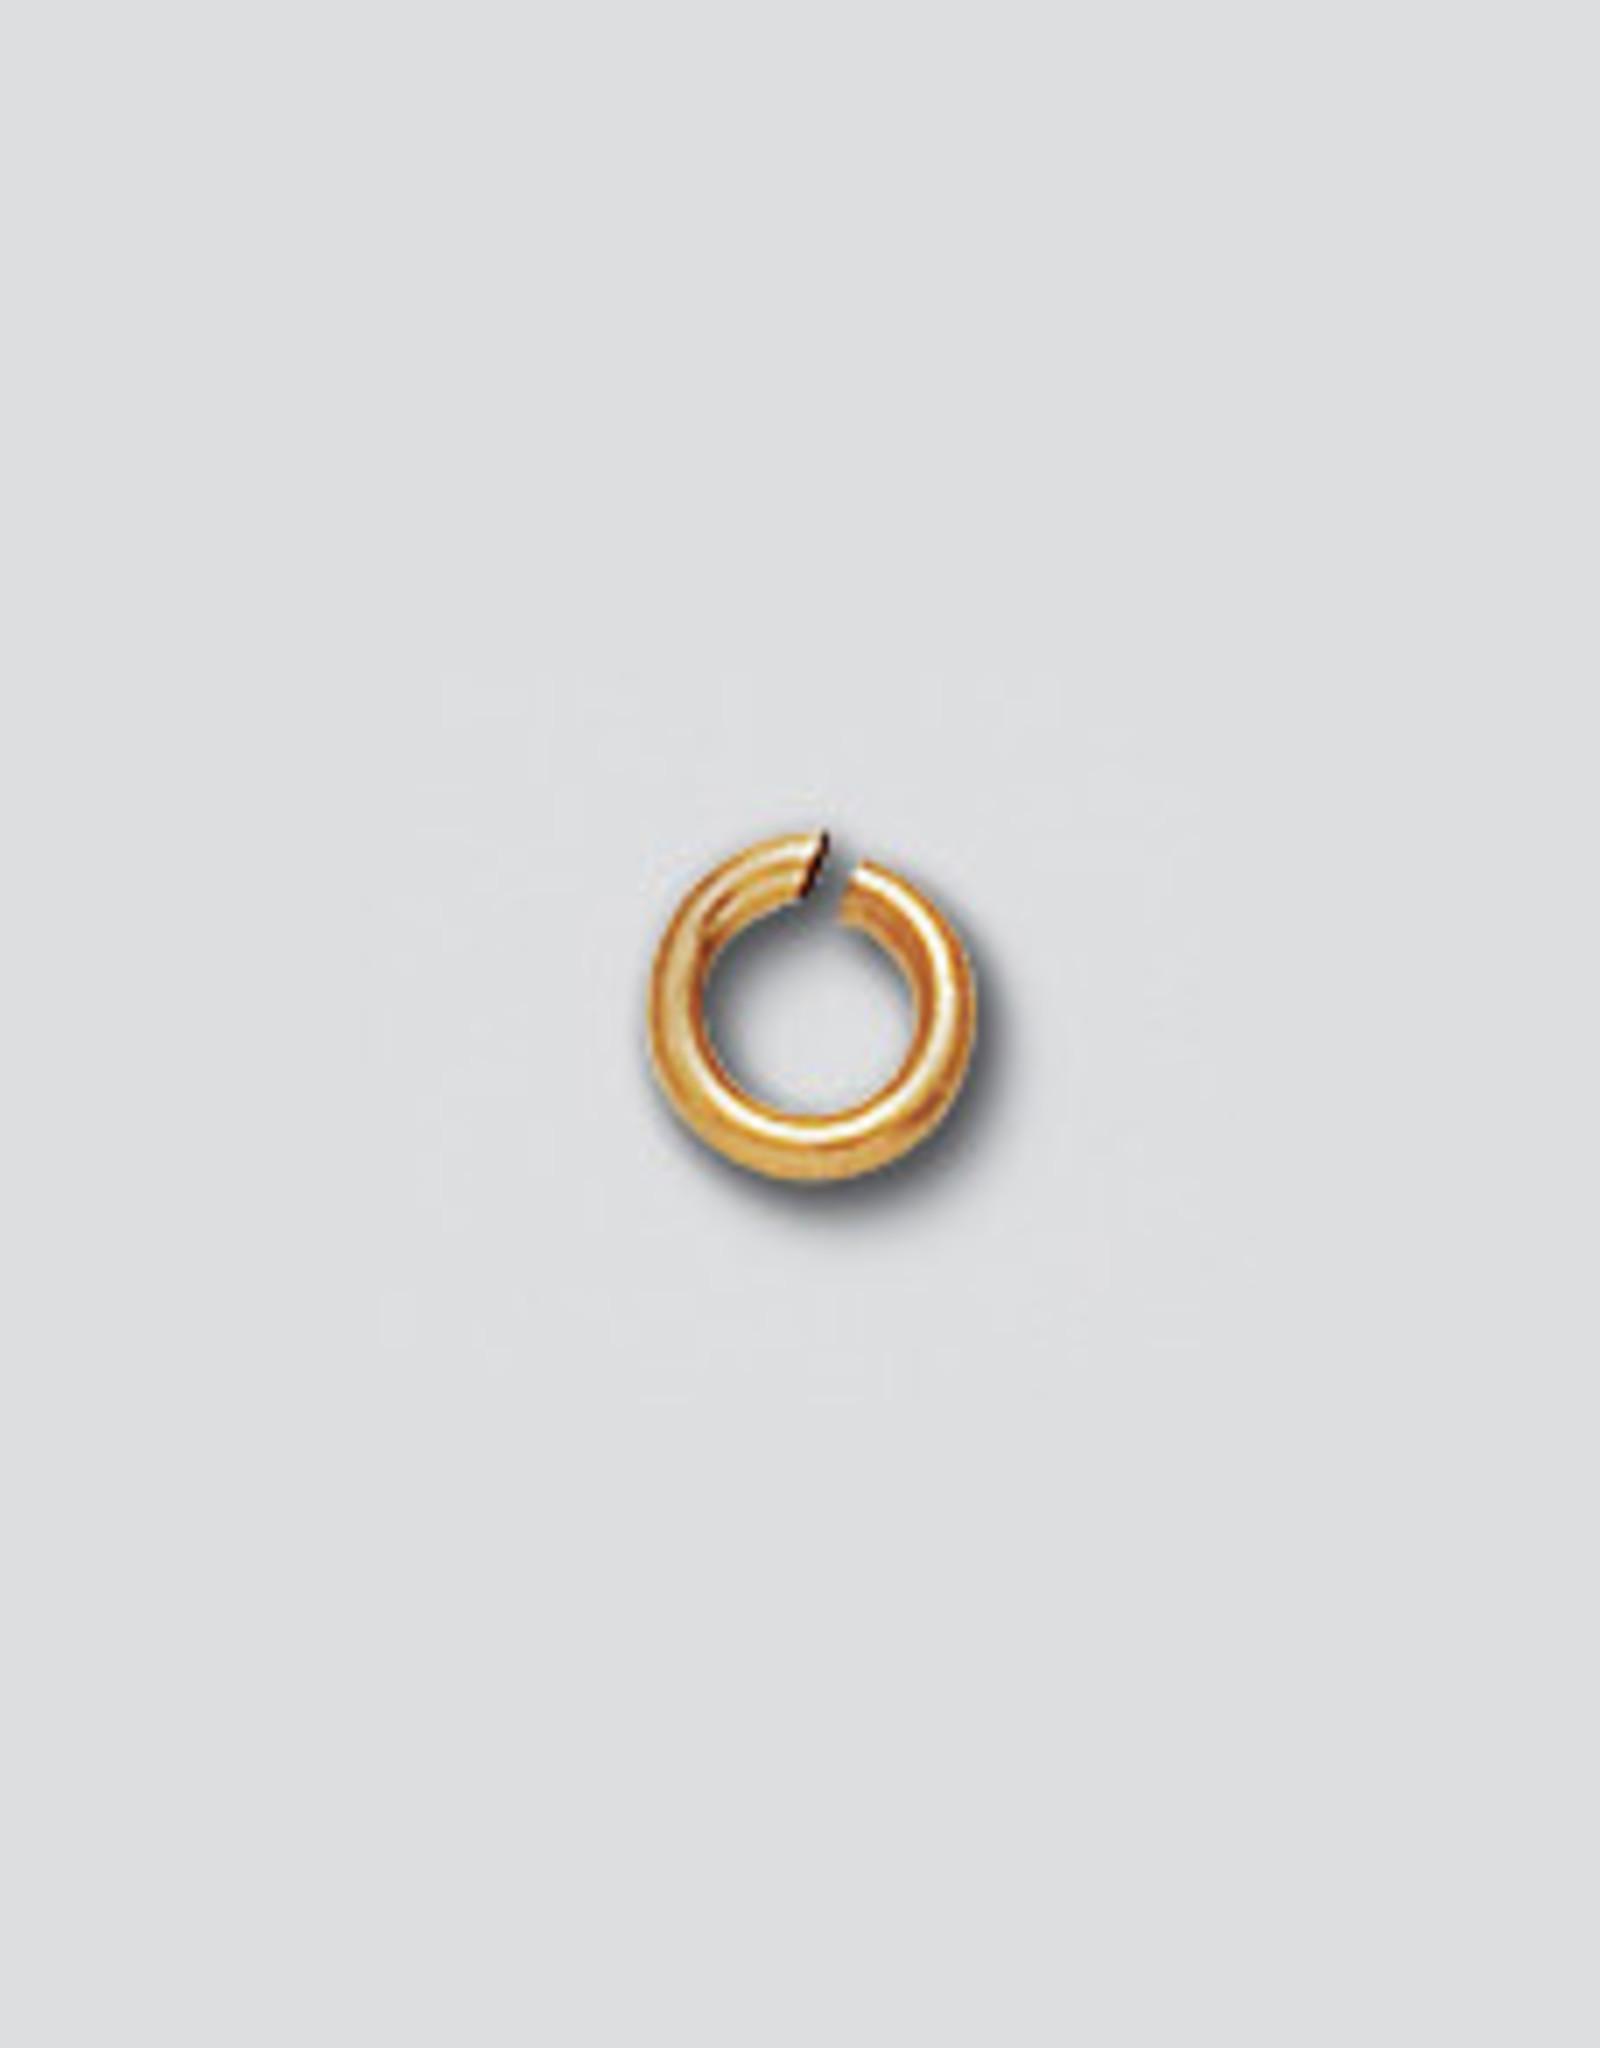 4mm Jump Ring 20 ga 14k Gold Filled Qty 10